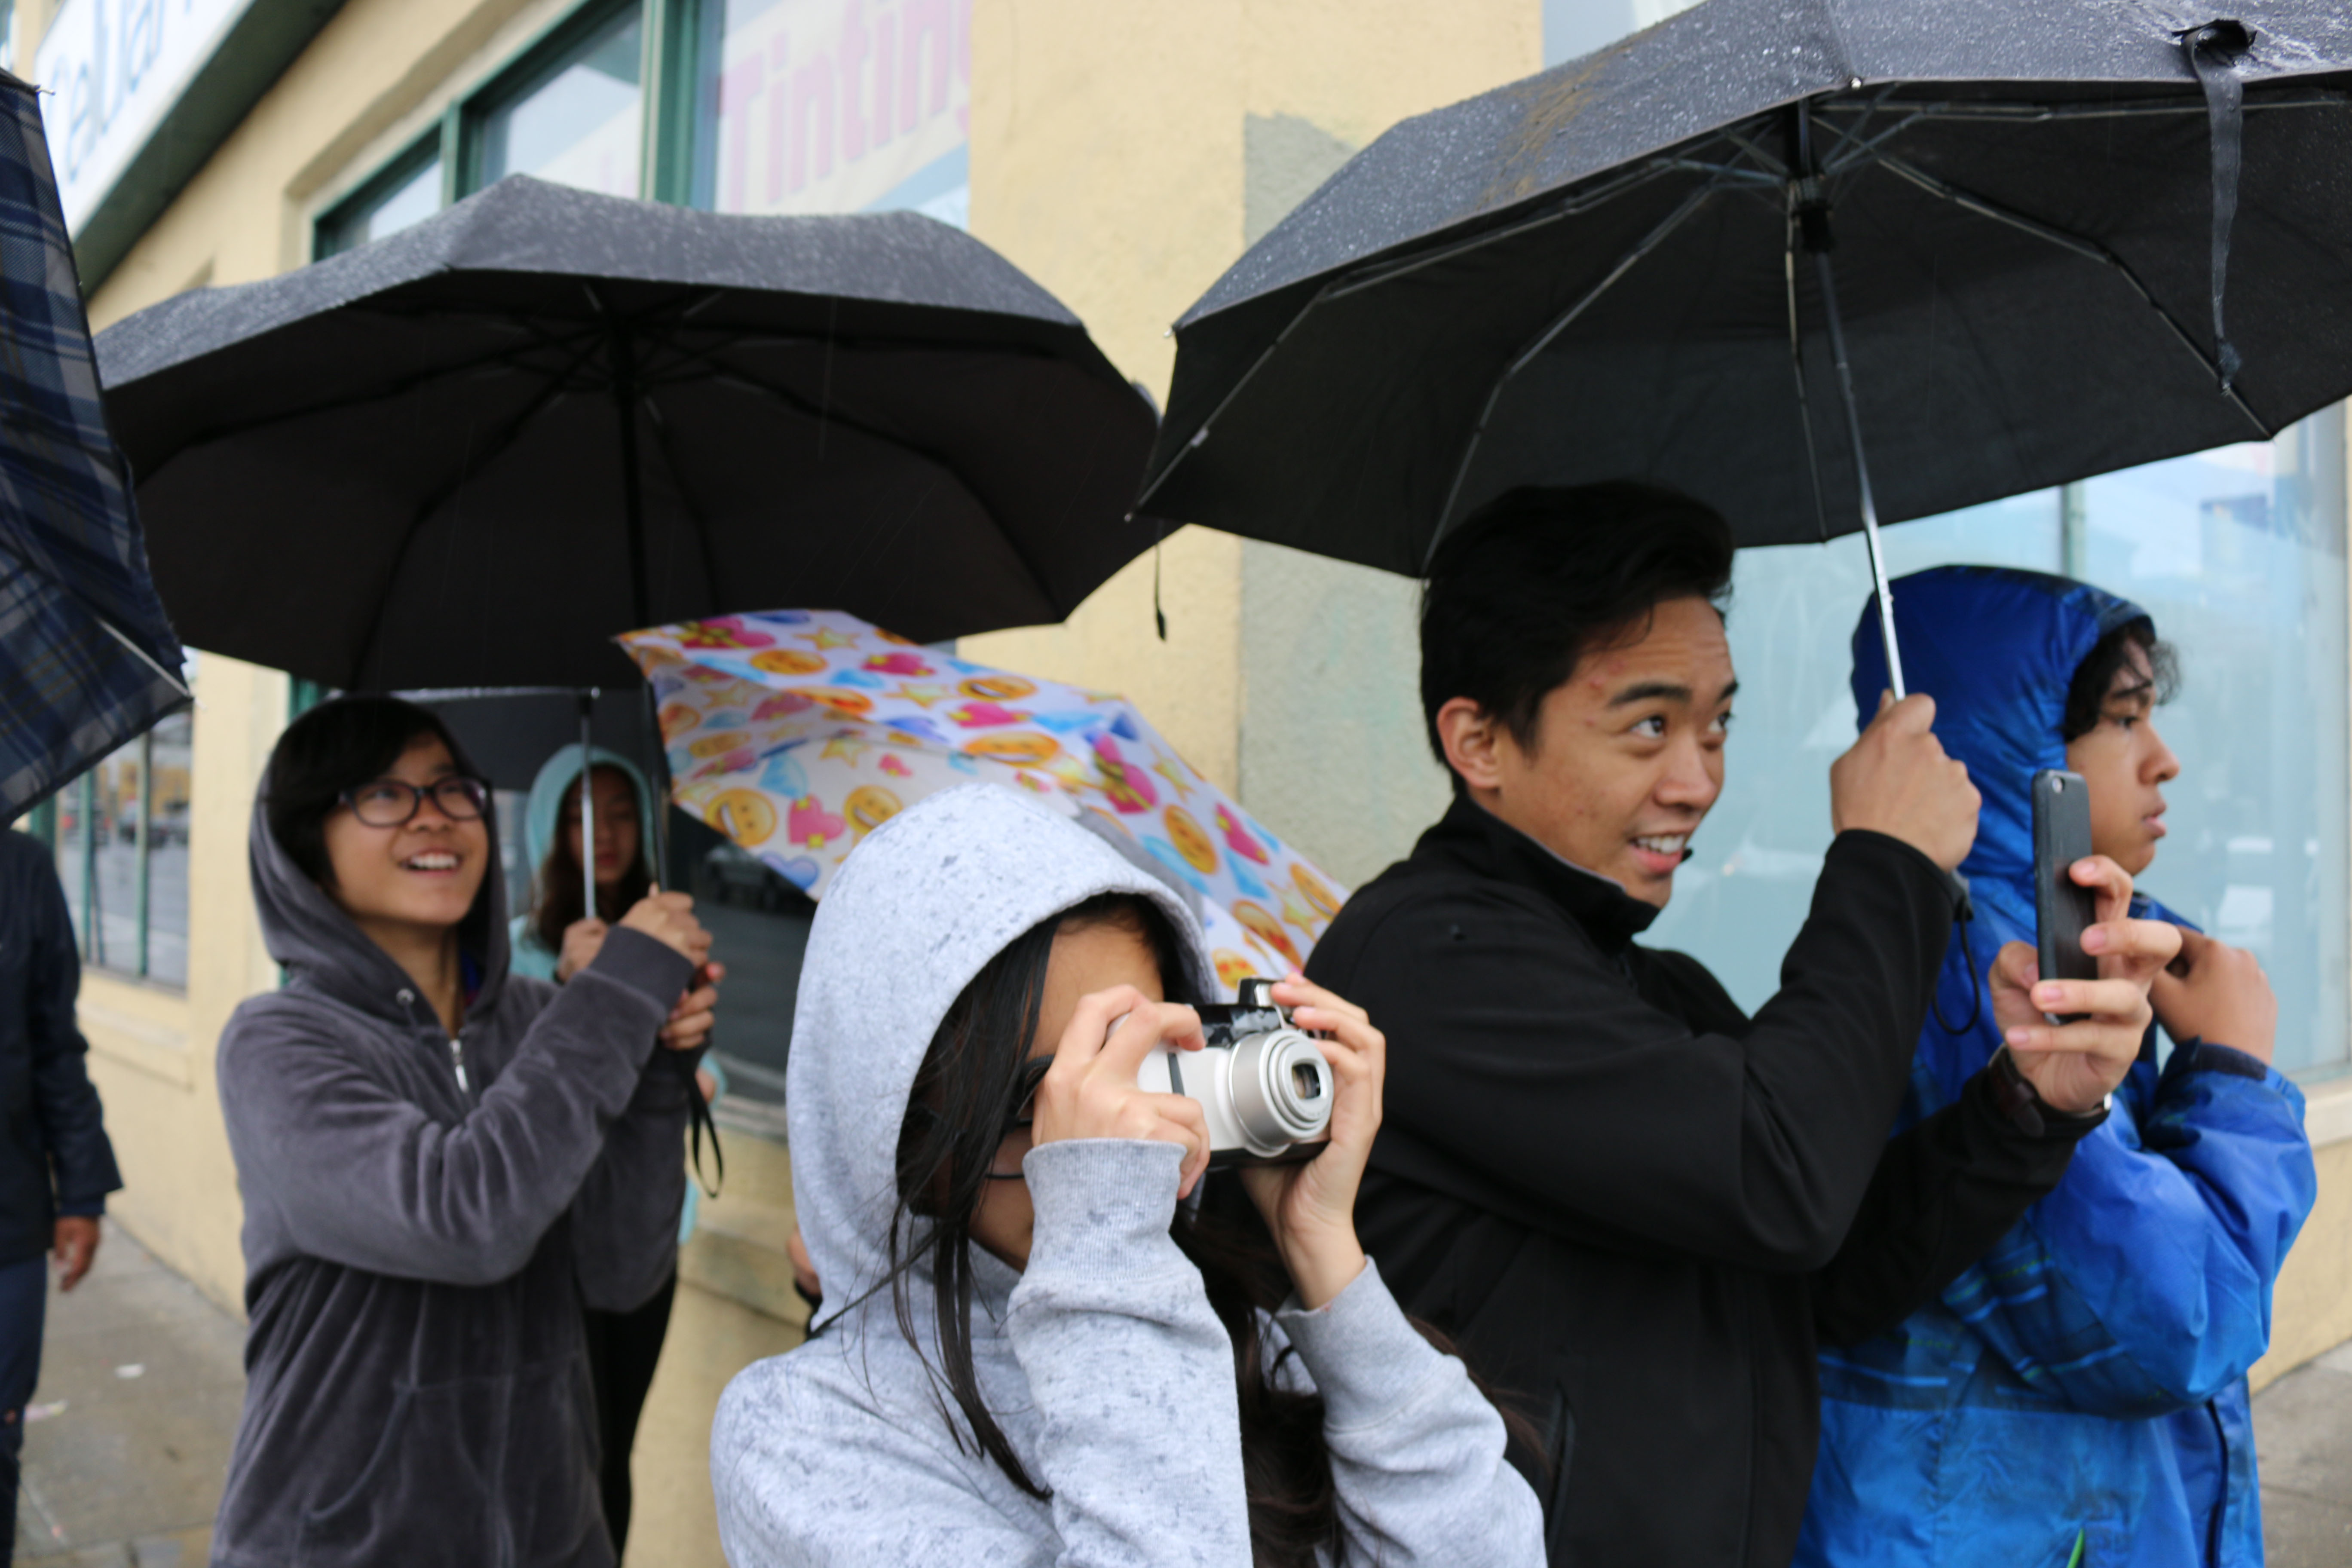 Yung scholarz with co-educator taking film photos in the rain in SOMA Pilipinas, SoMapagmahal, 2017.